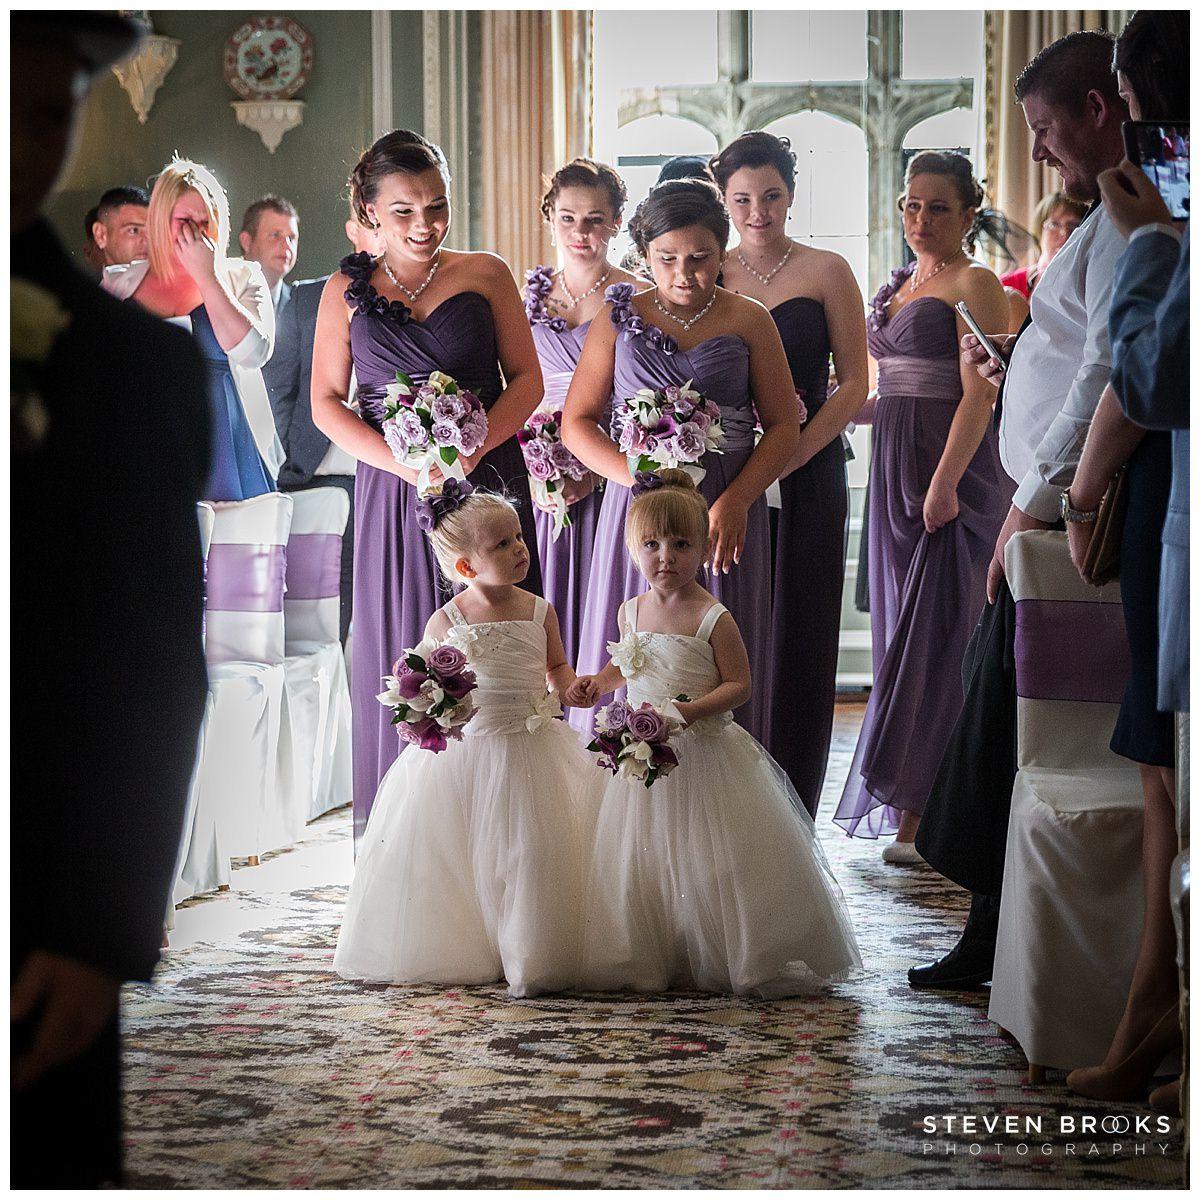 Leeds Castle wedding photographer steven brooks photographs the bridal party entering the wedding ceremony room